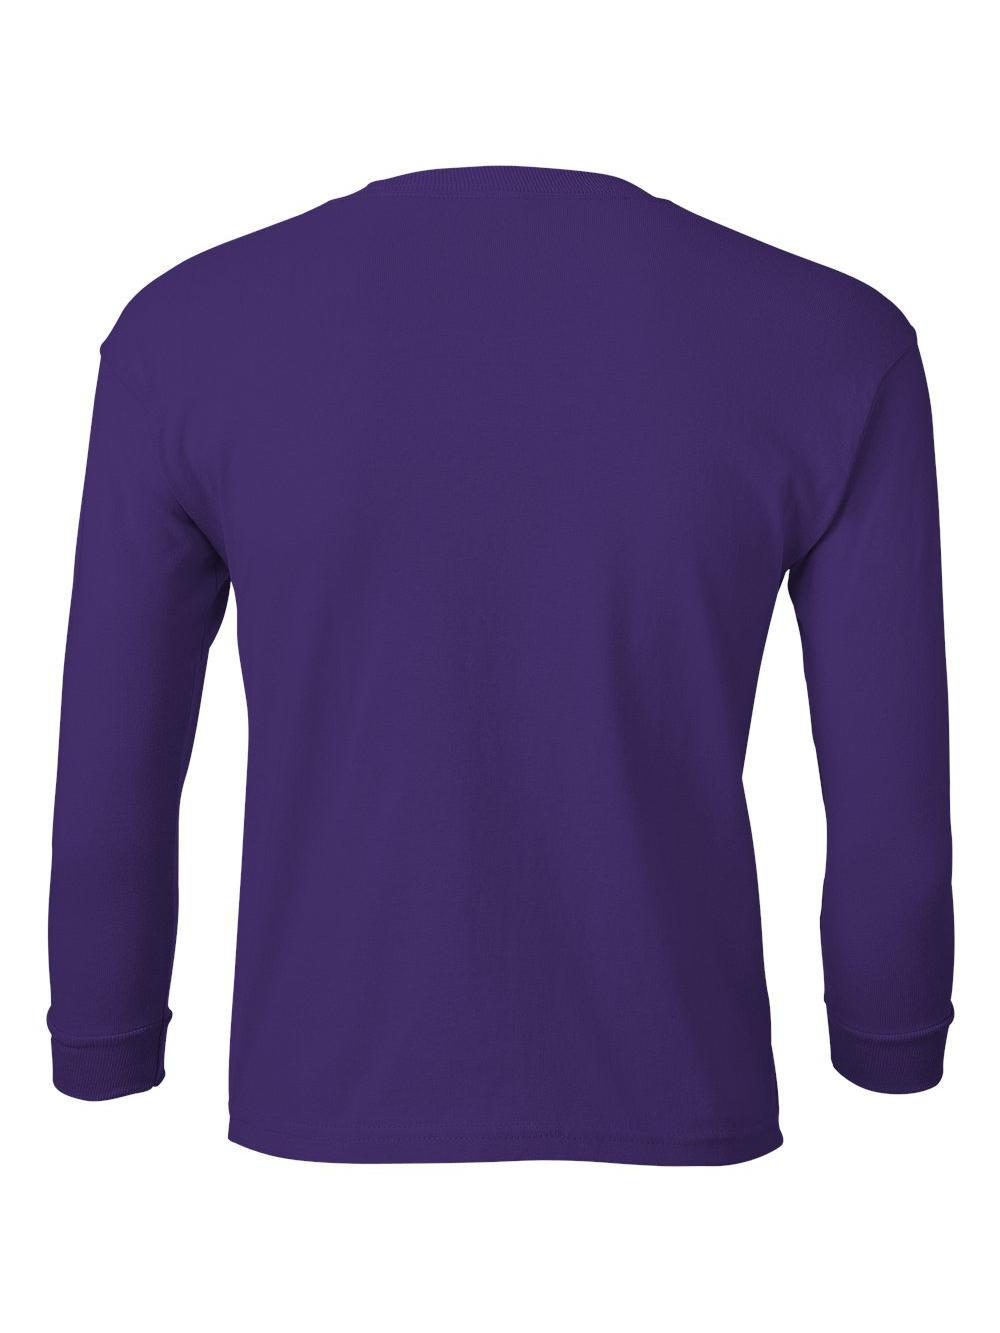 Gildan-Ultra-Cotton-Youth-Long-Sleeve-T-Shirt-2400B thumbnail 31